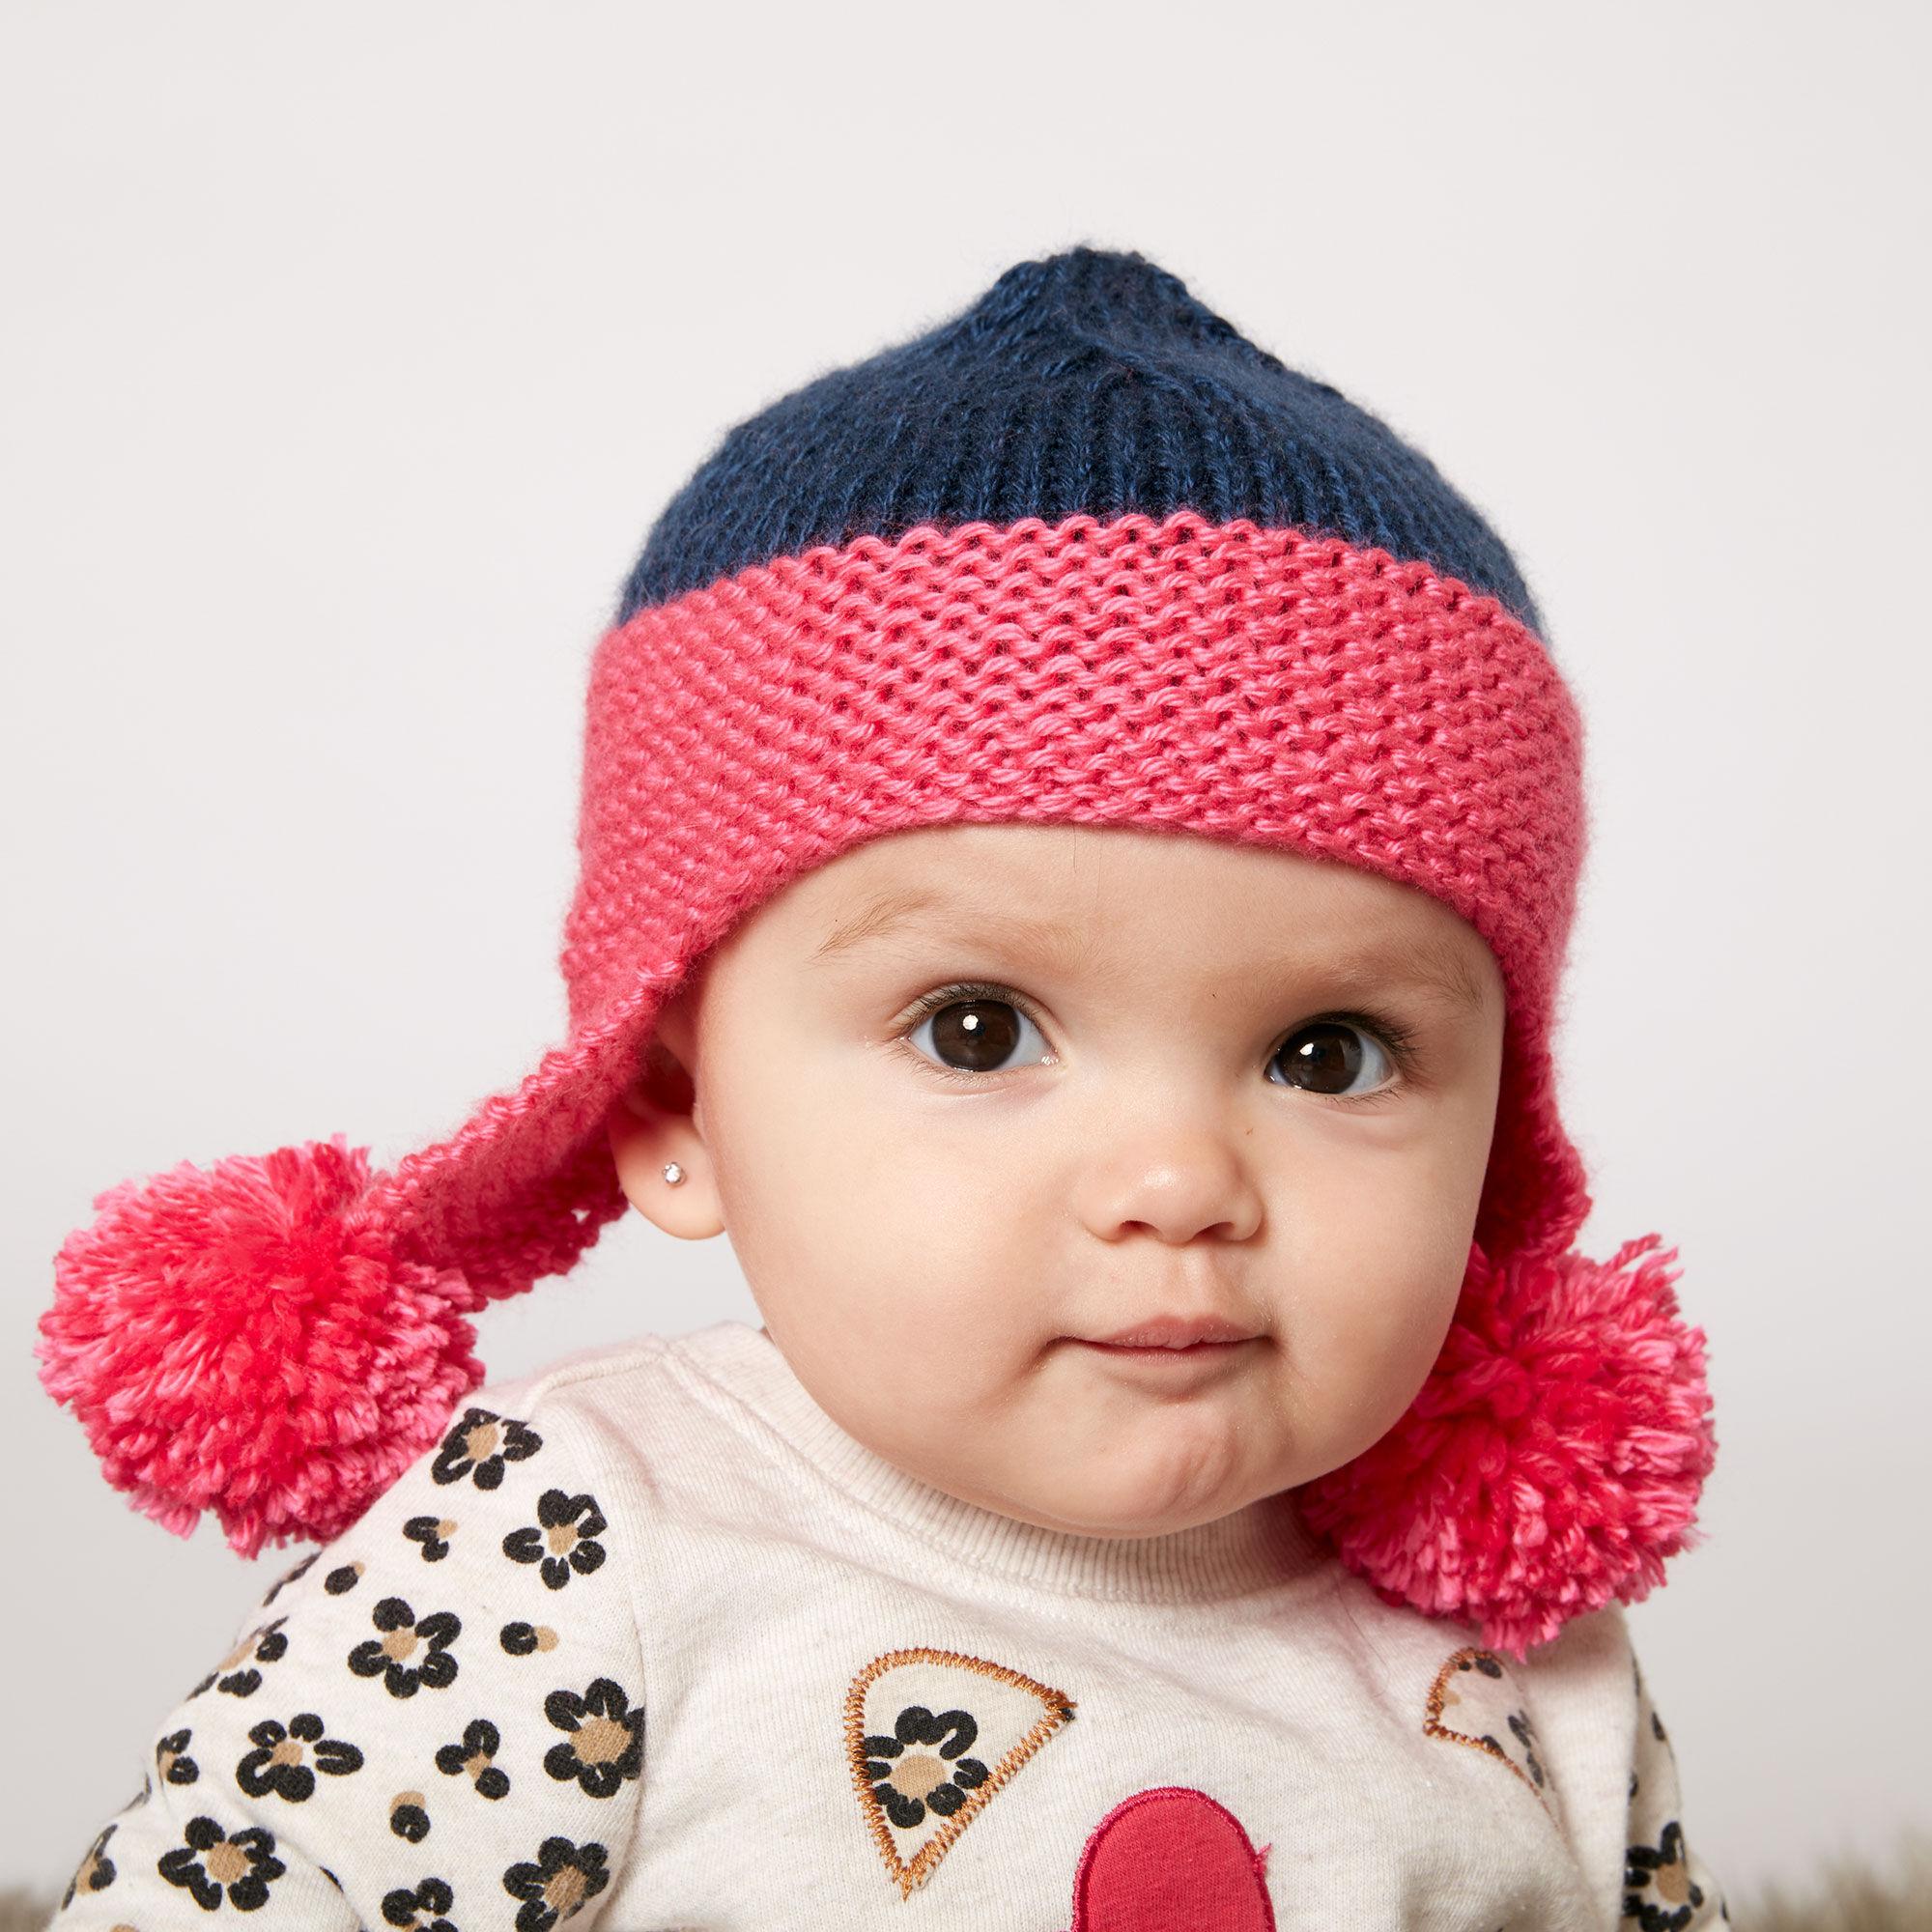 Caron Baby Earflap Hat | Yarnspirations